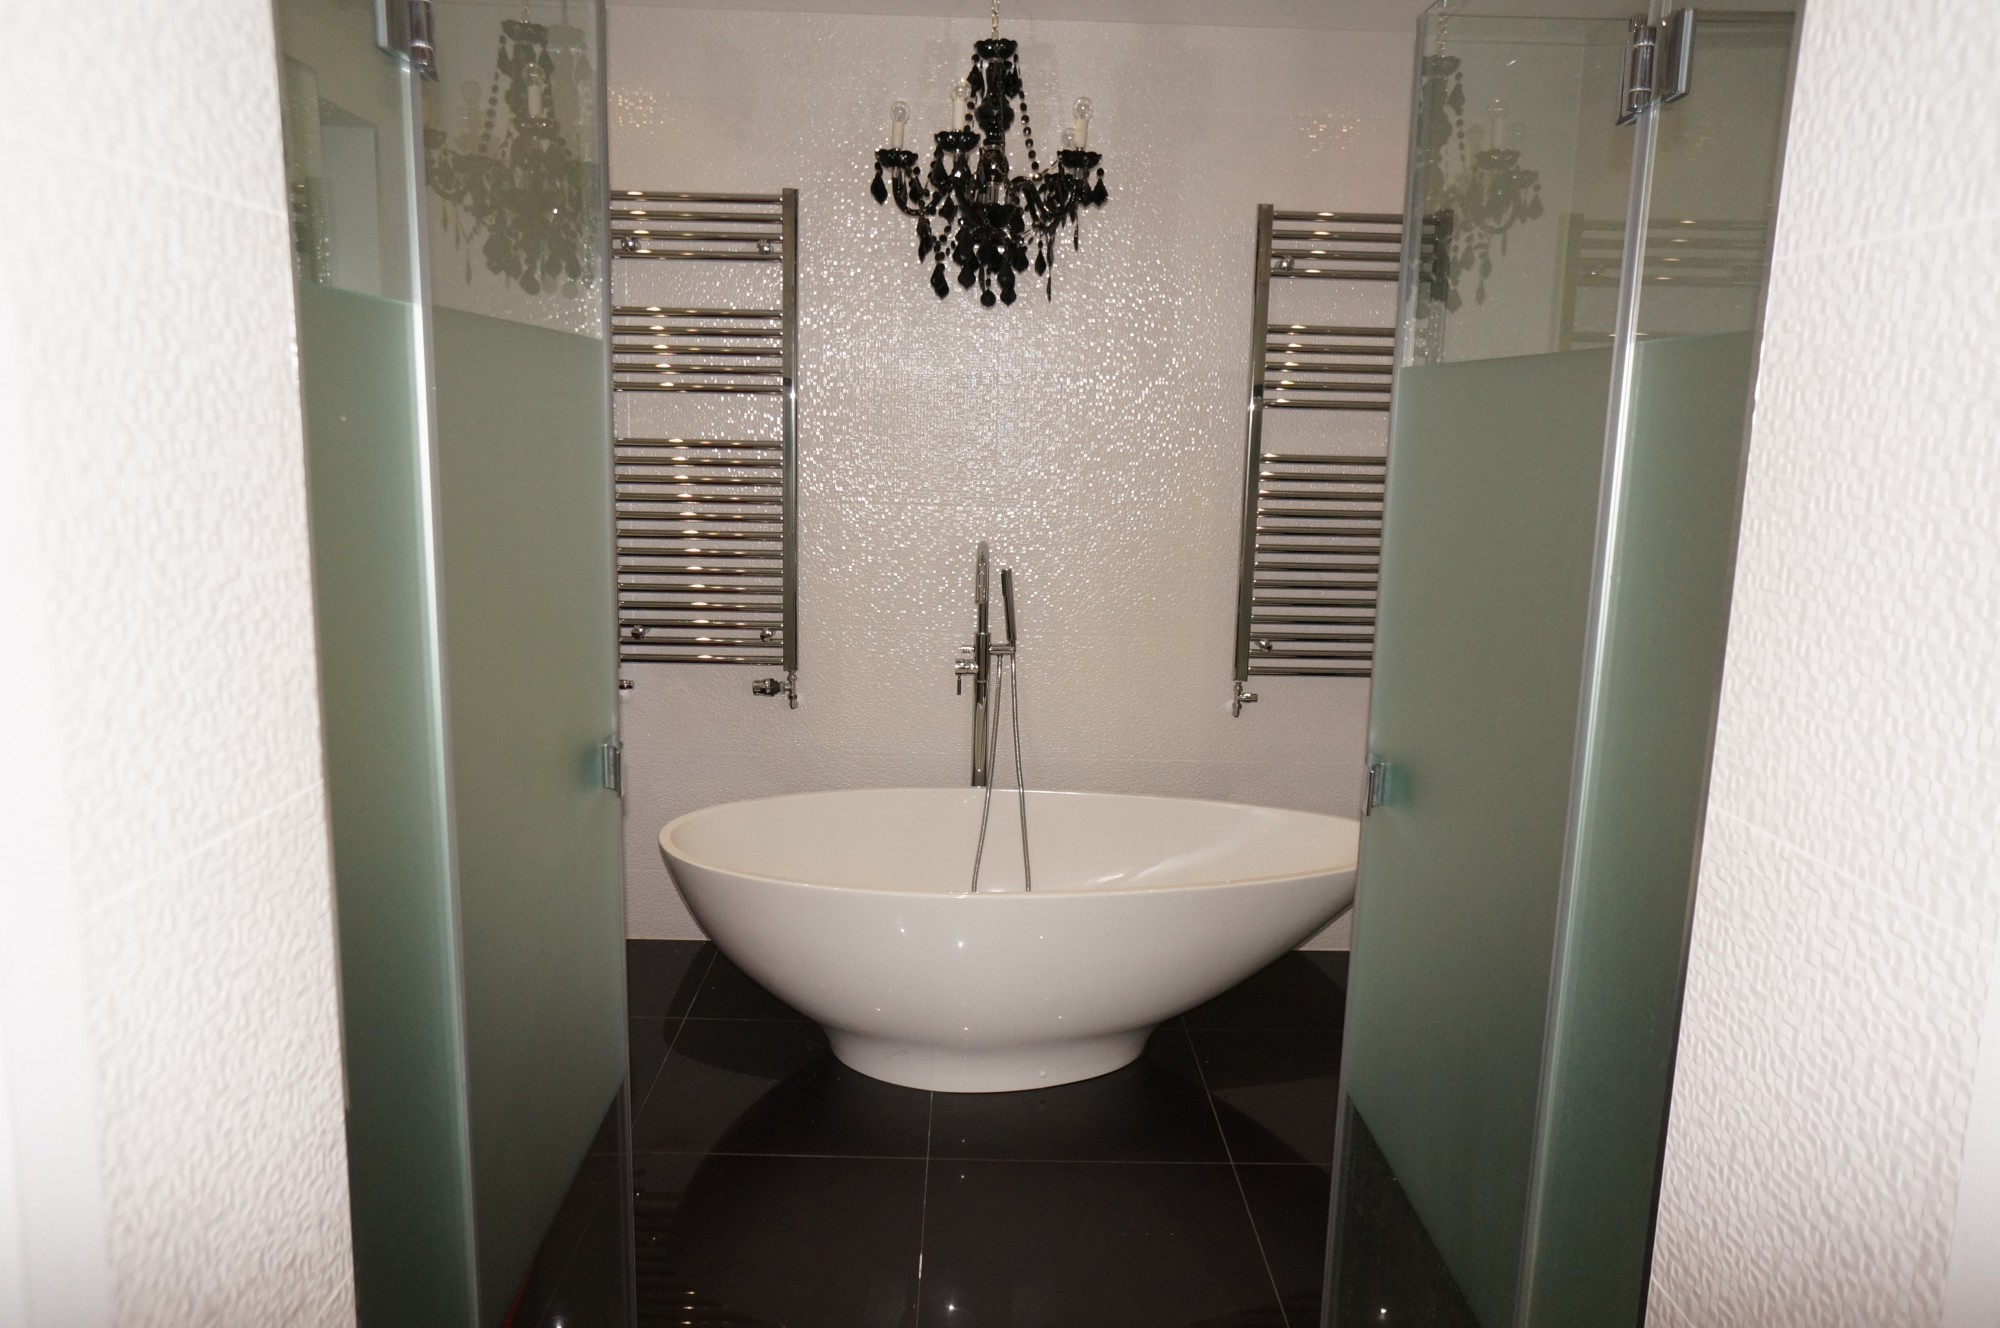 Villeroy and Boch,Amara Property,HansGrohe,Bathroom detail